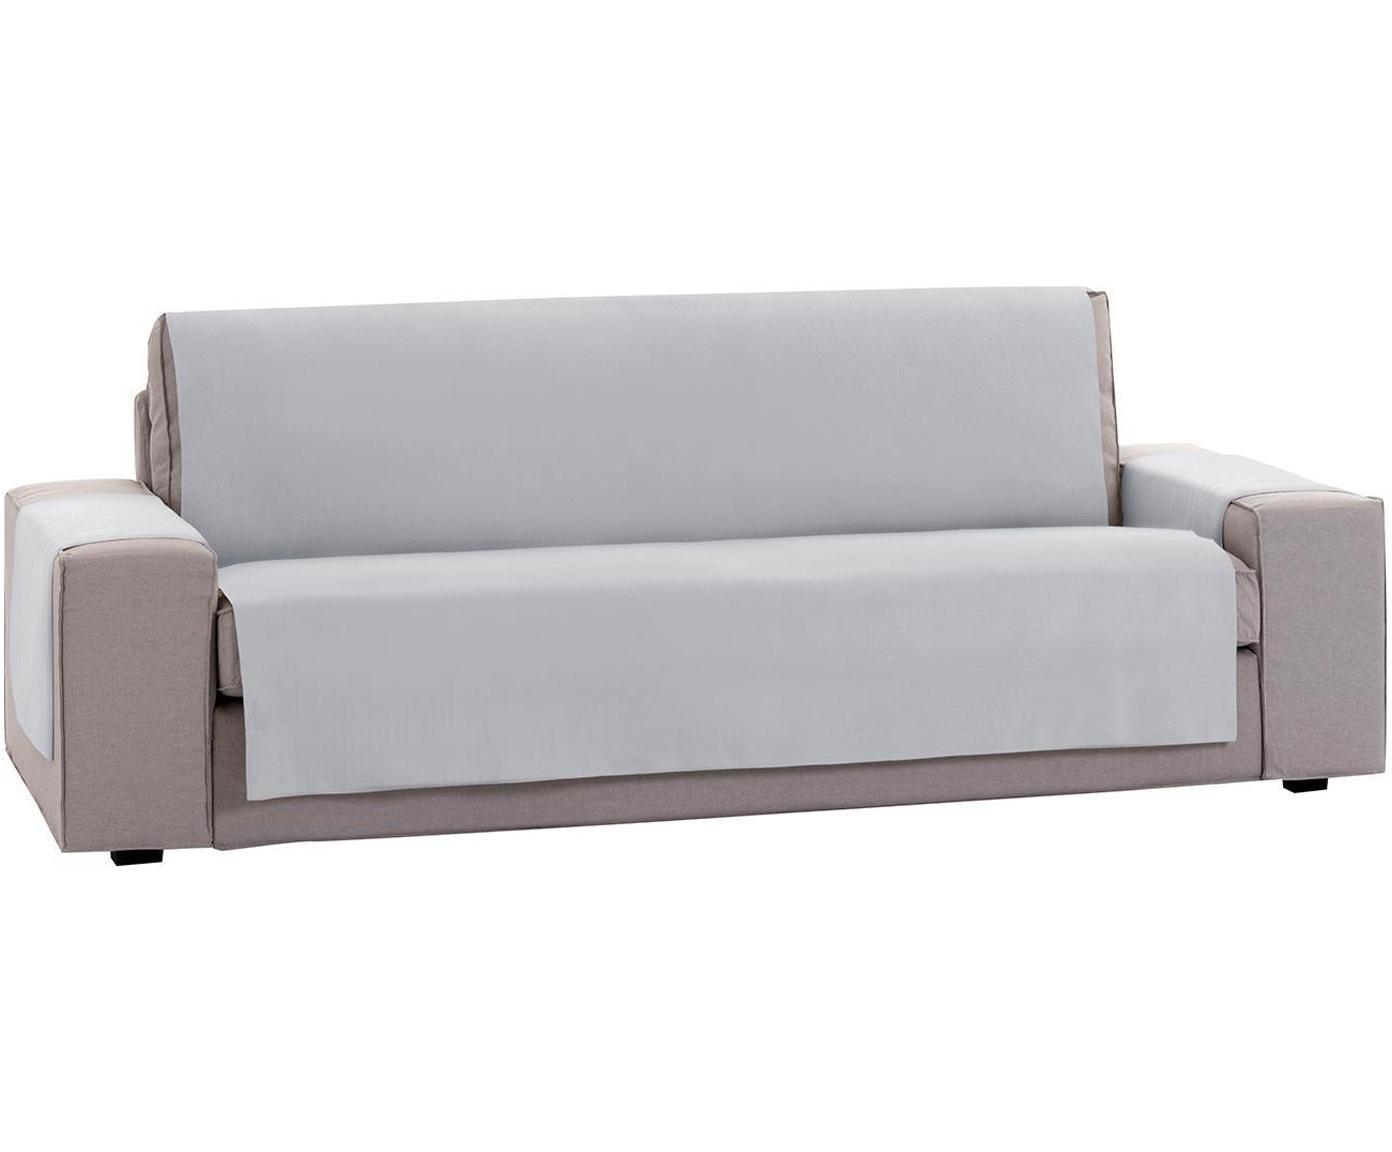 Funda de sofá Levante, 50%algodón, 50%poliéster, Gris, 2 plazas (115 x 220cm)